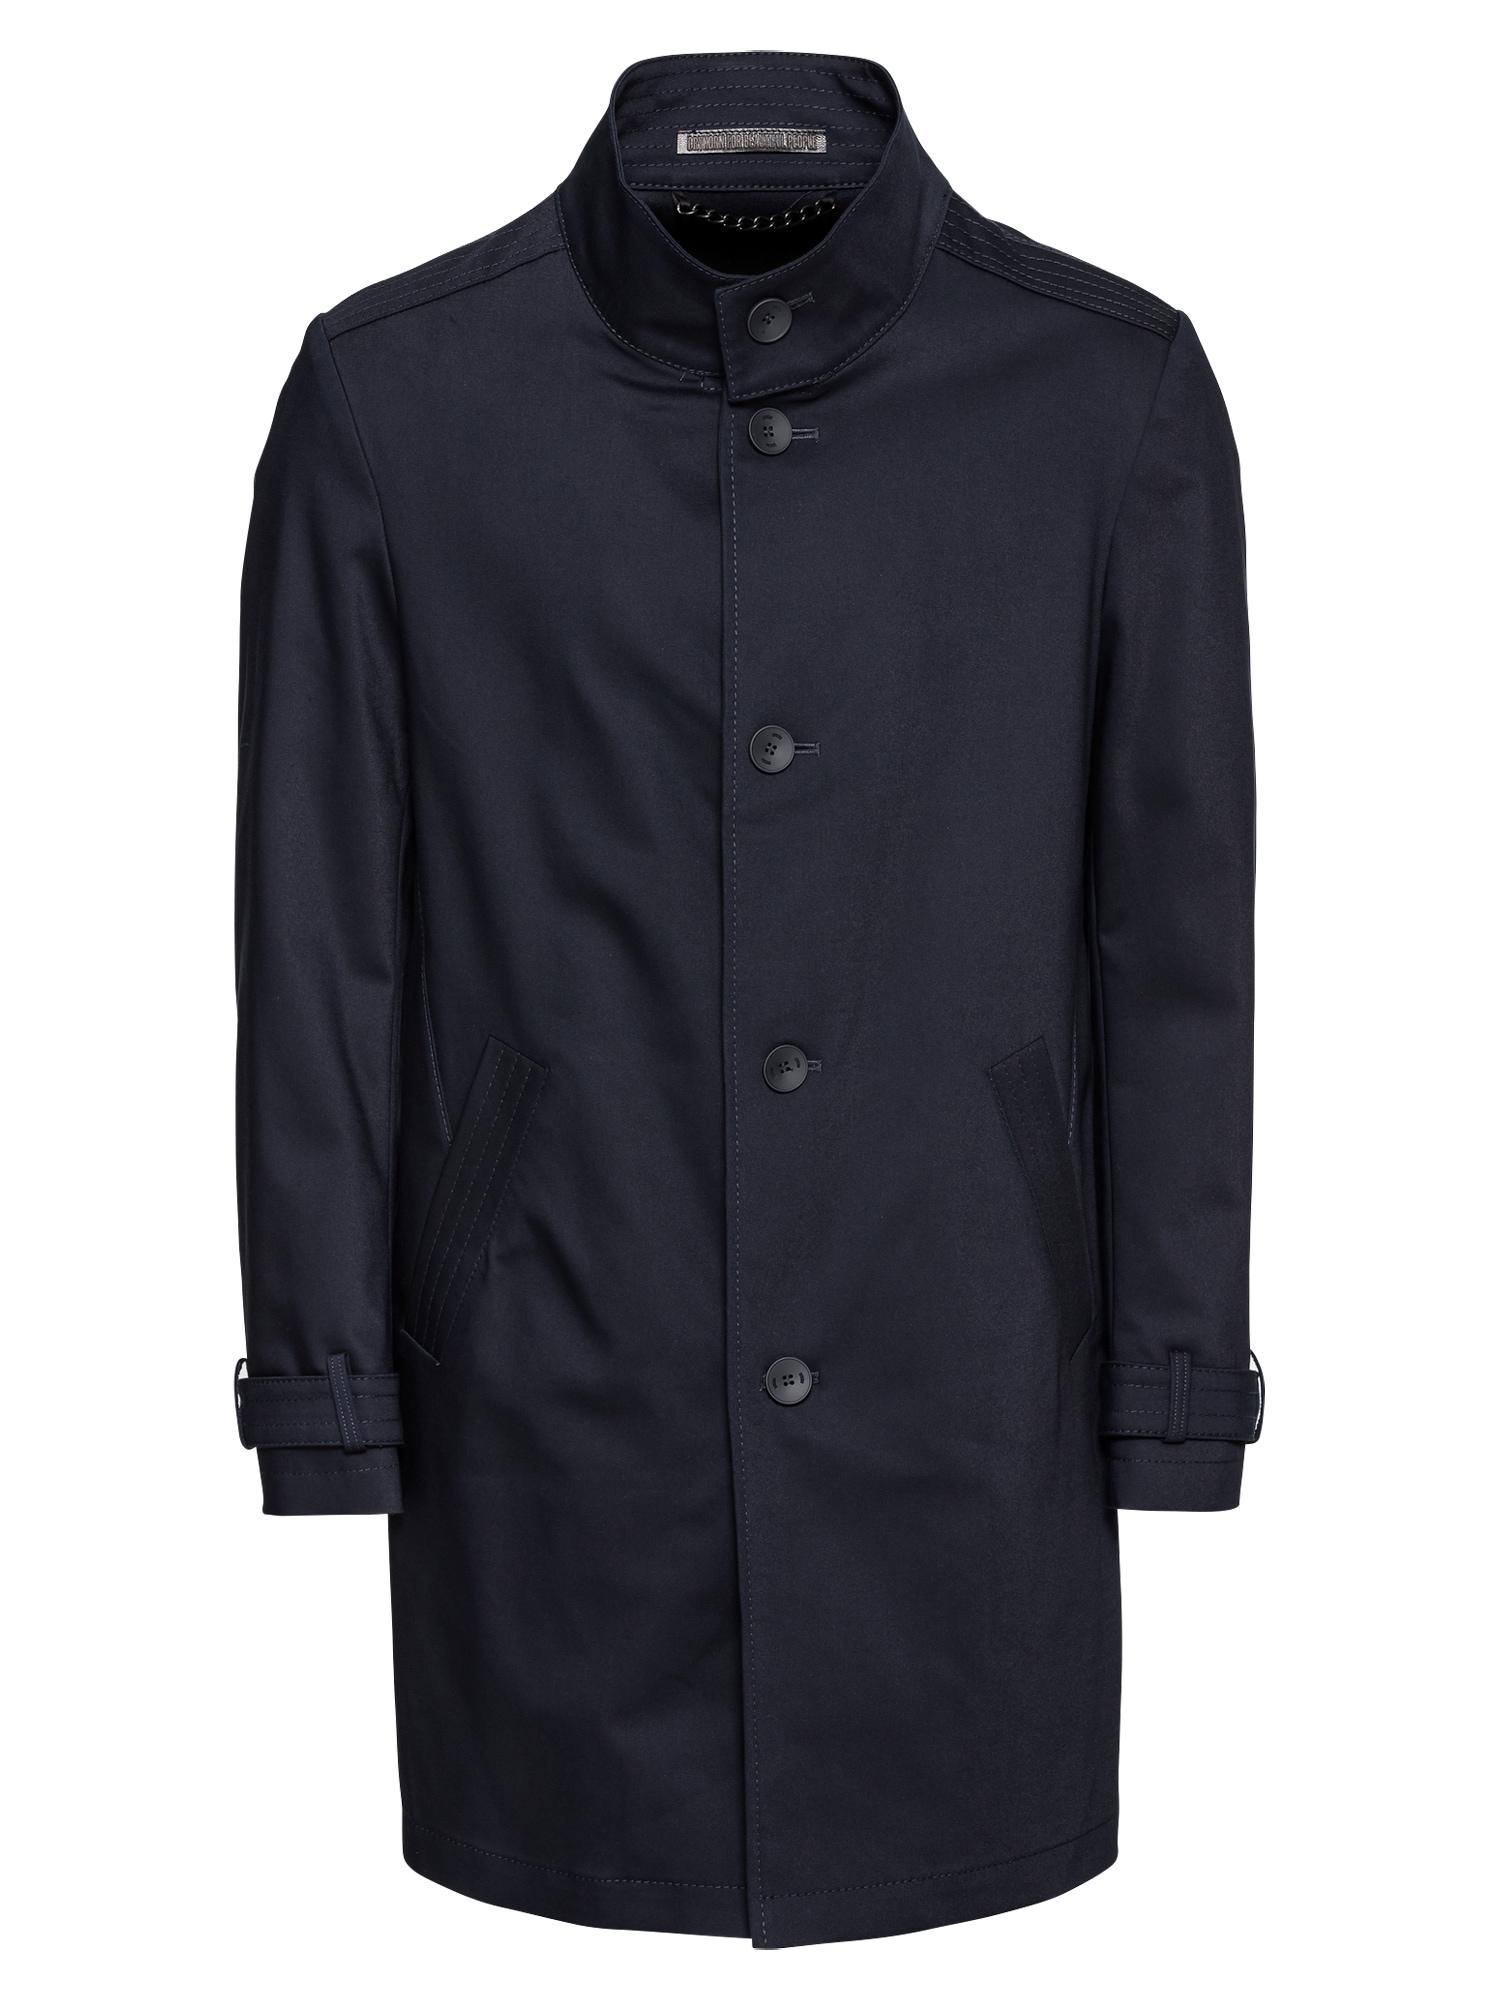 Přechodný kabát ONNEX tmavě modrá DRYKORN